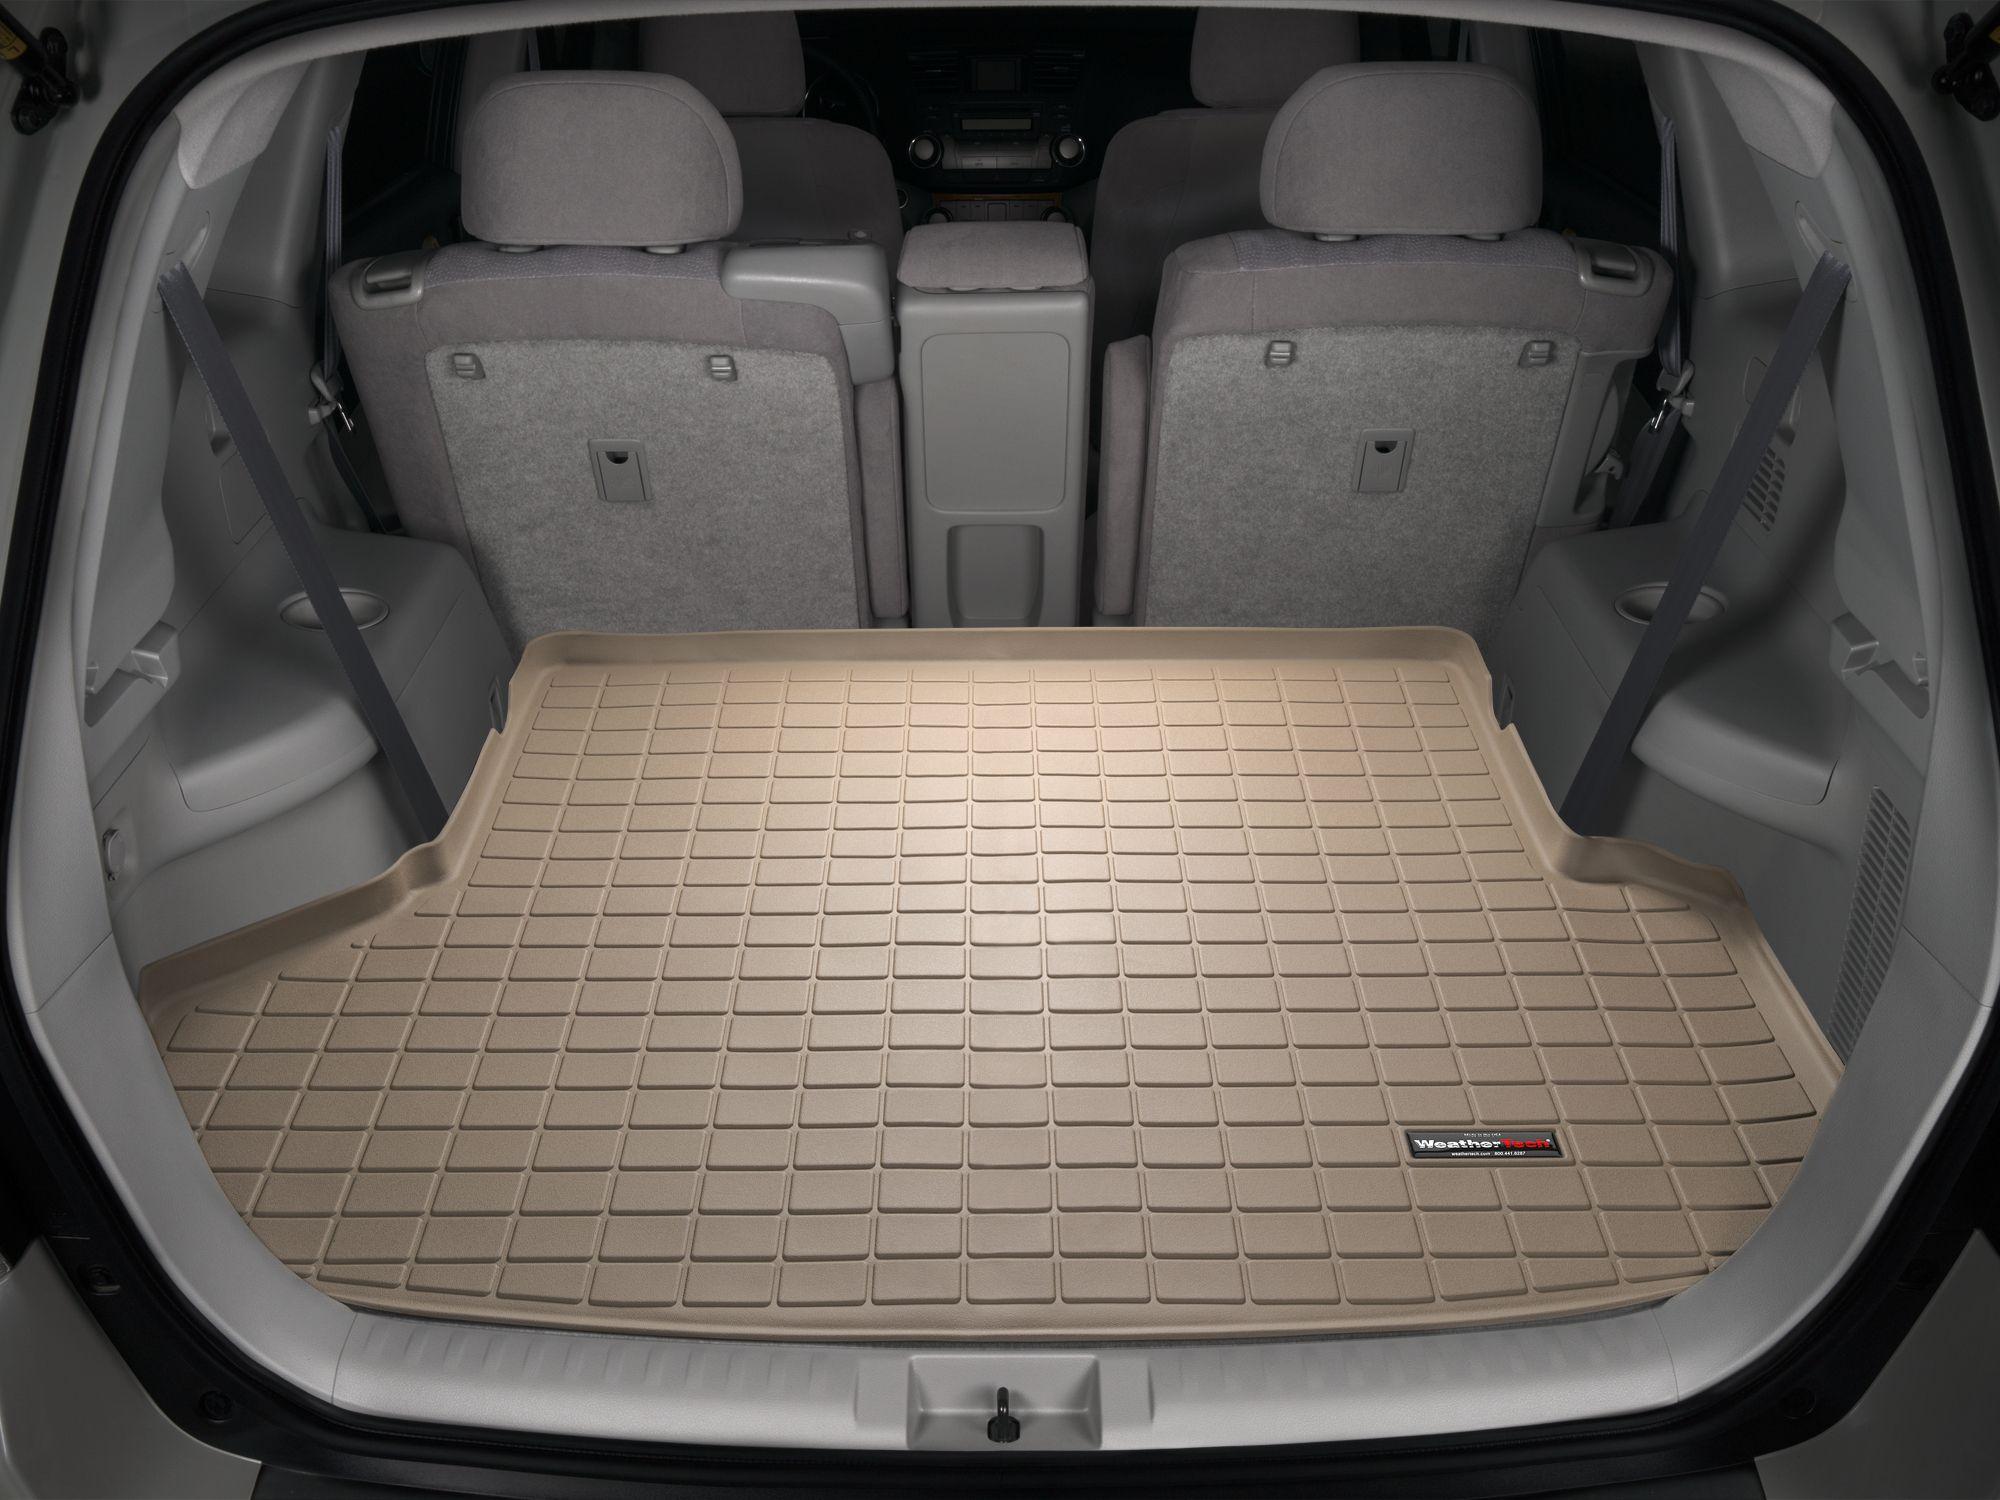 Toyota 2010 Highlander Cargo/Trunk Liner (With images